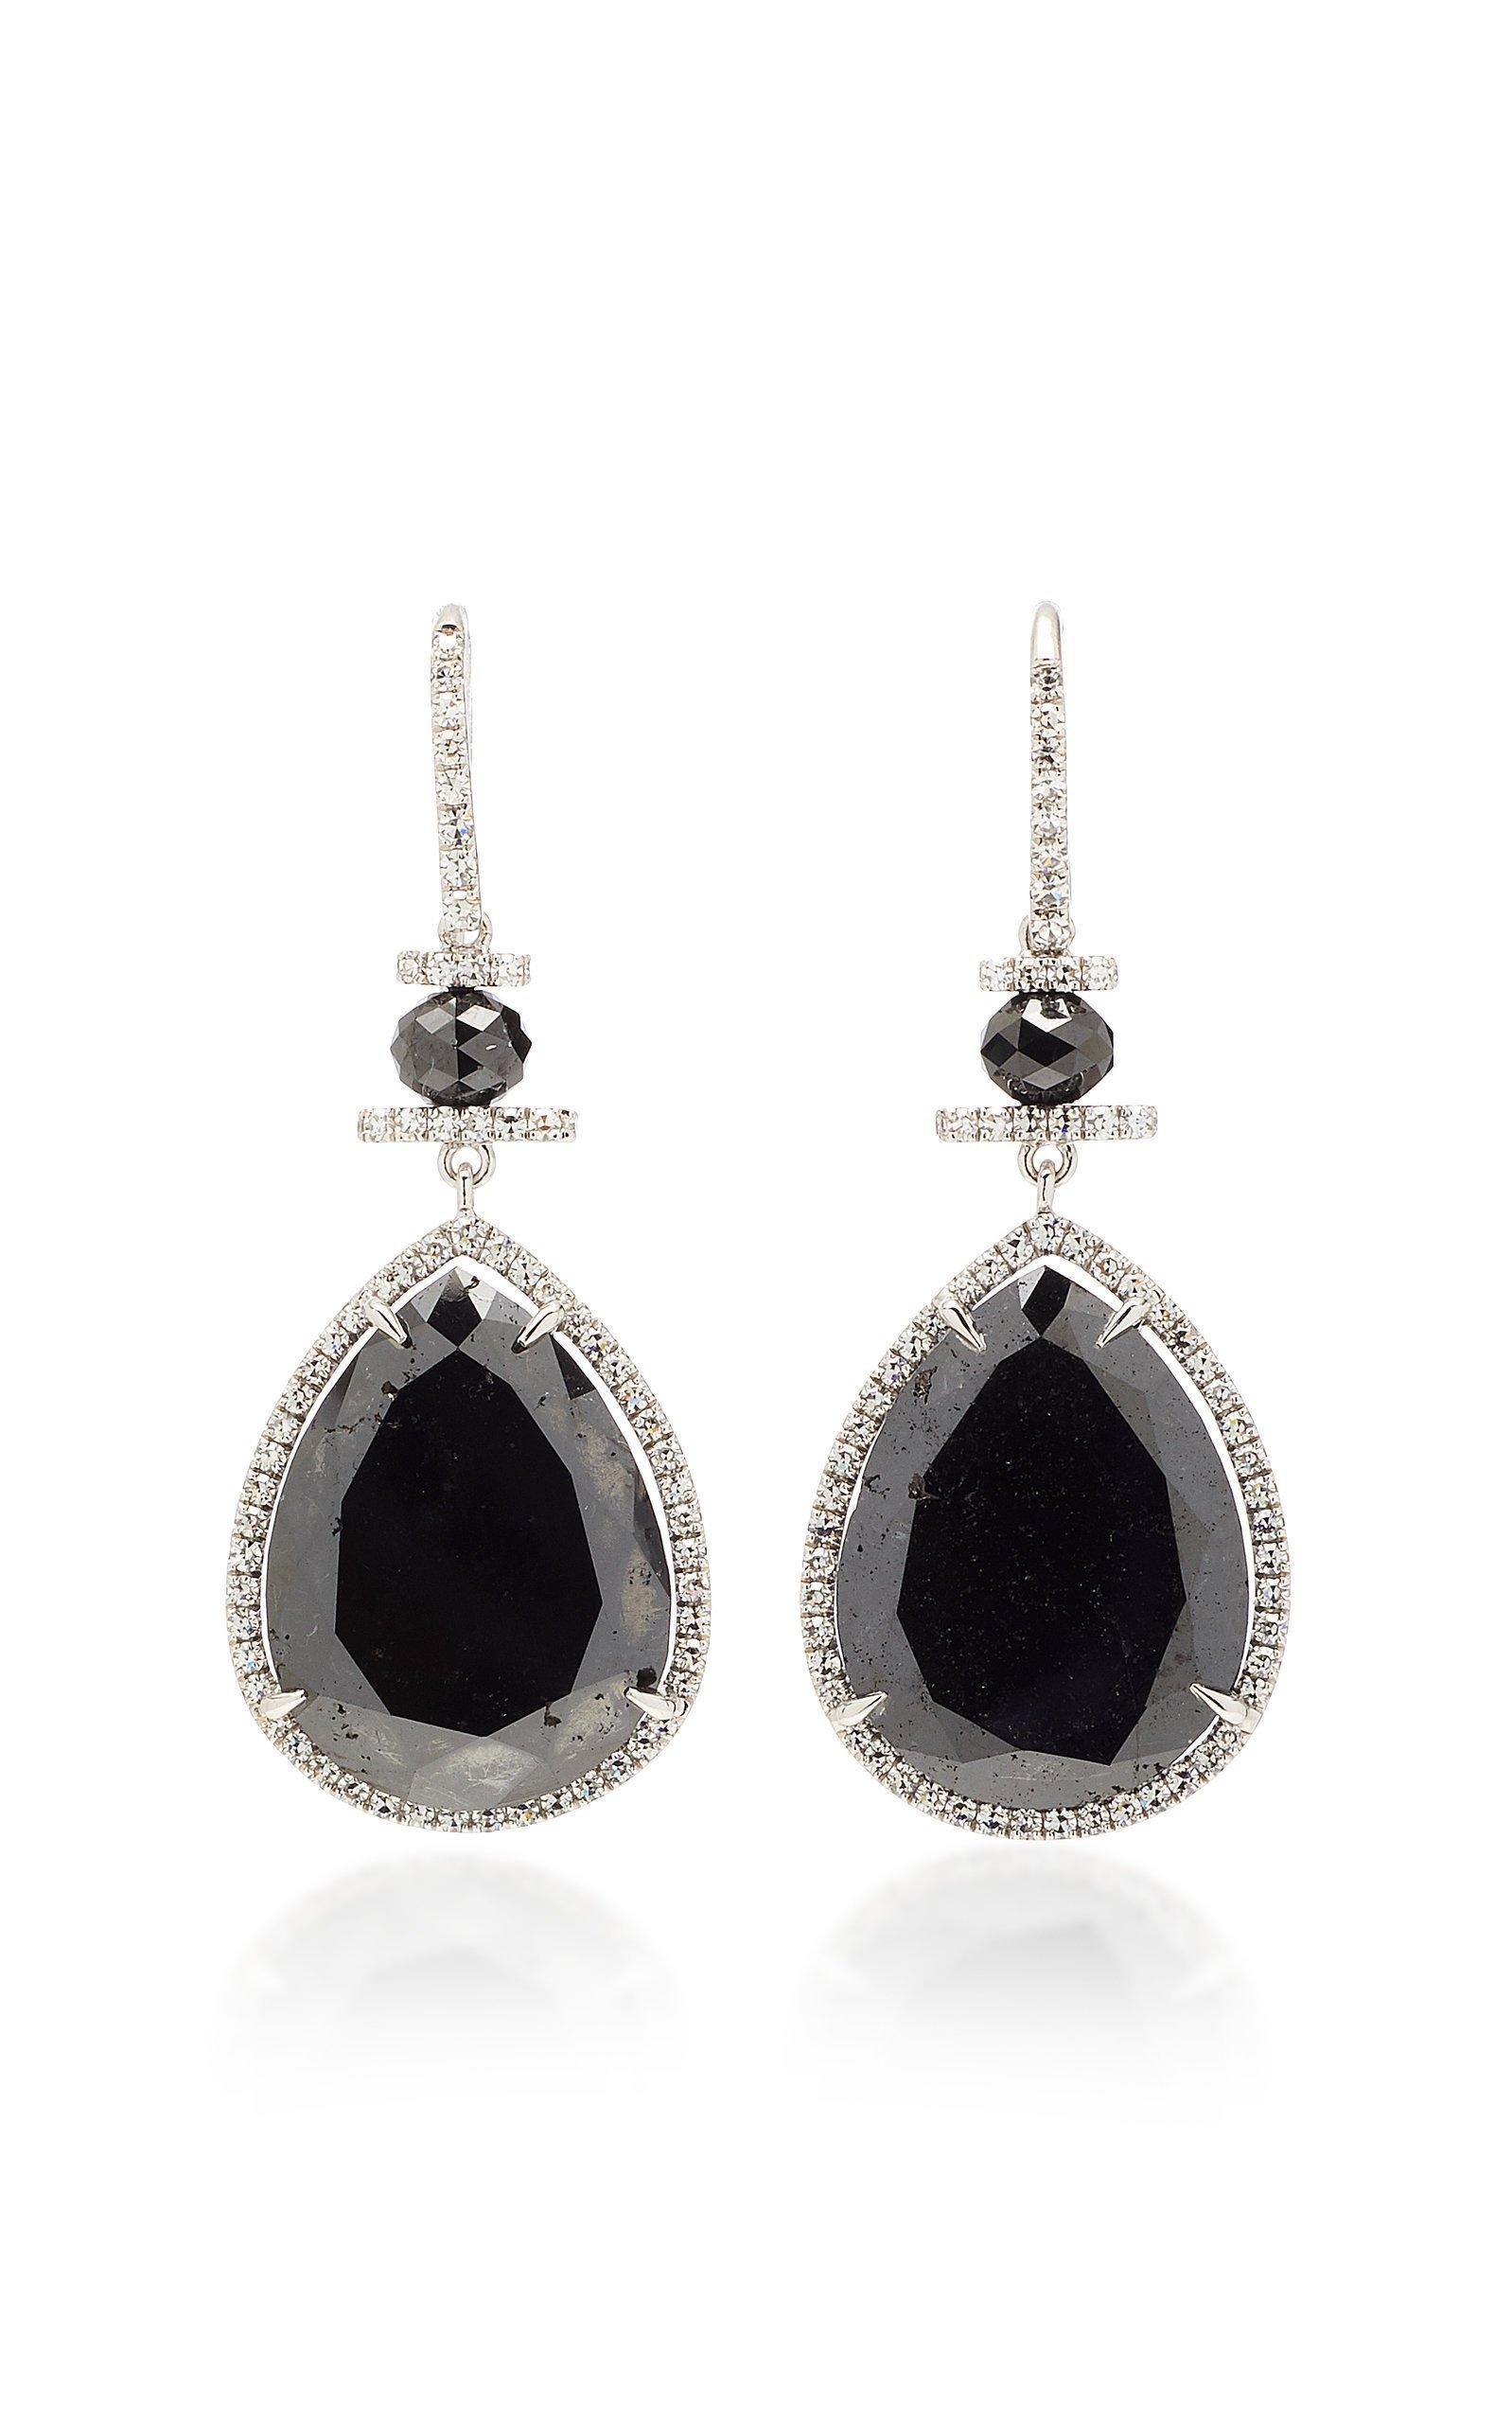 Martin Katz Pear-Shaped Black Diamond Drop Earrings